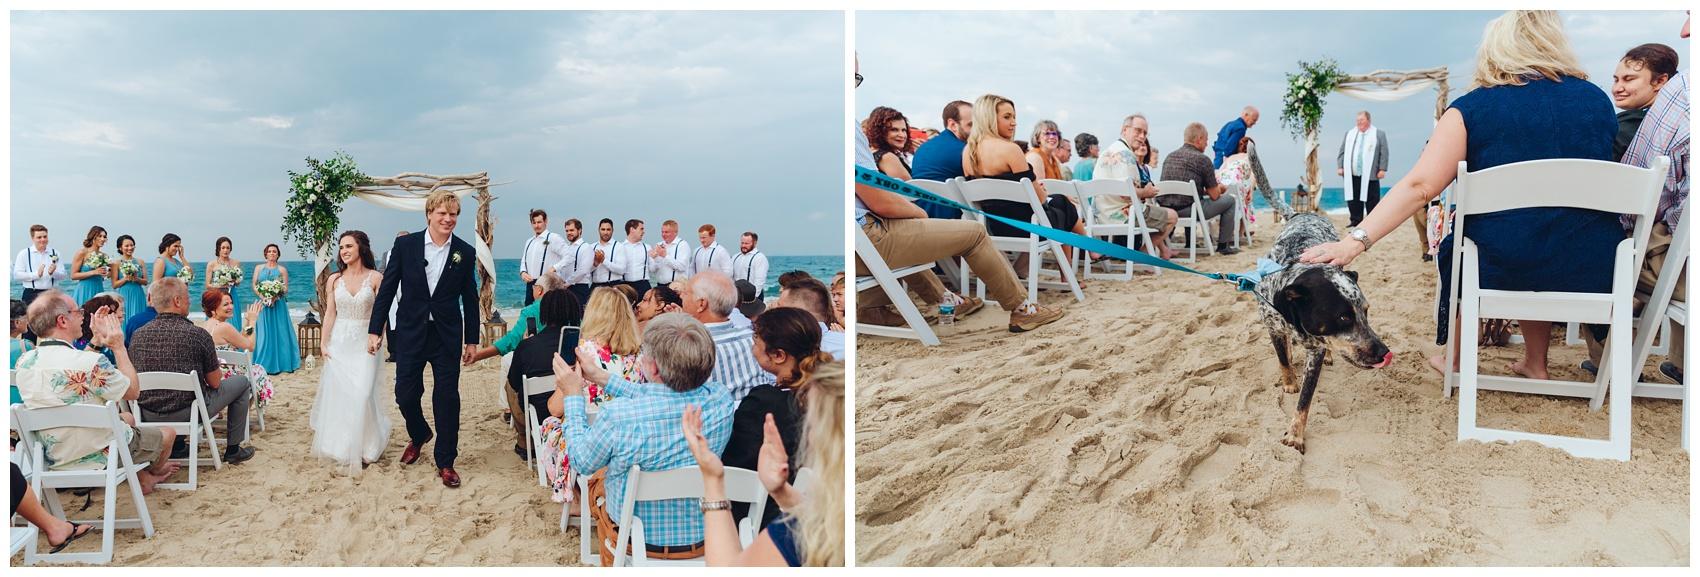 Outer-Banks-Corolla-Wedding_0072.jpg